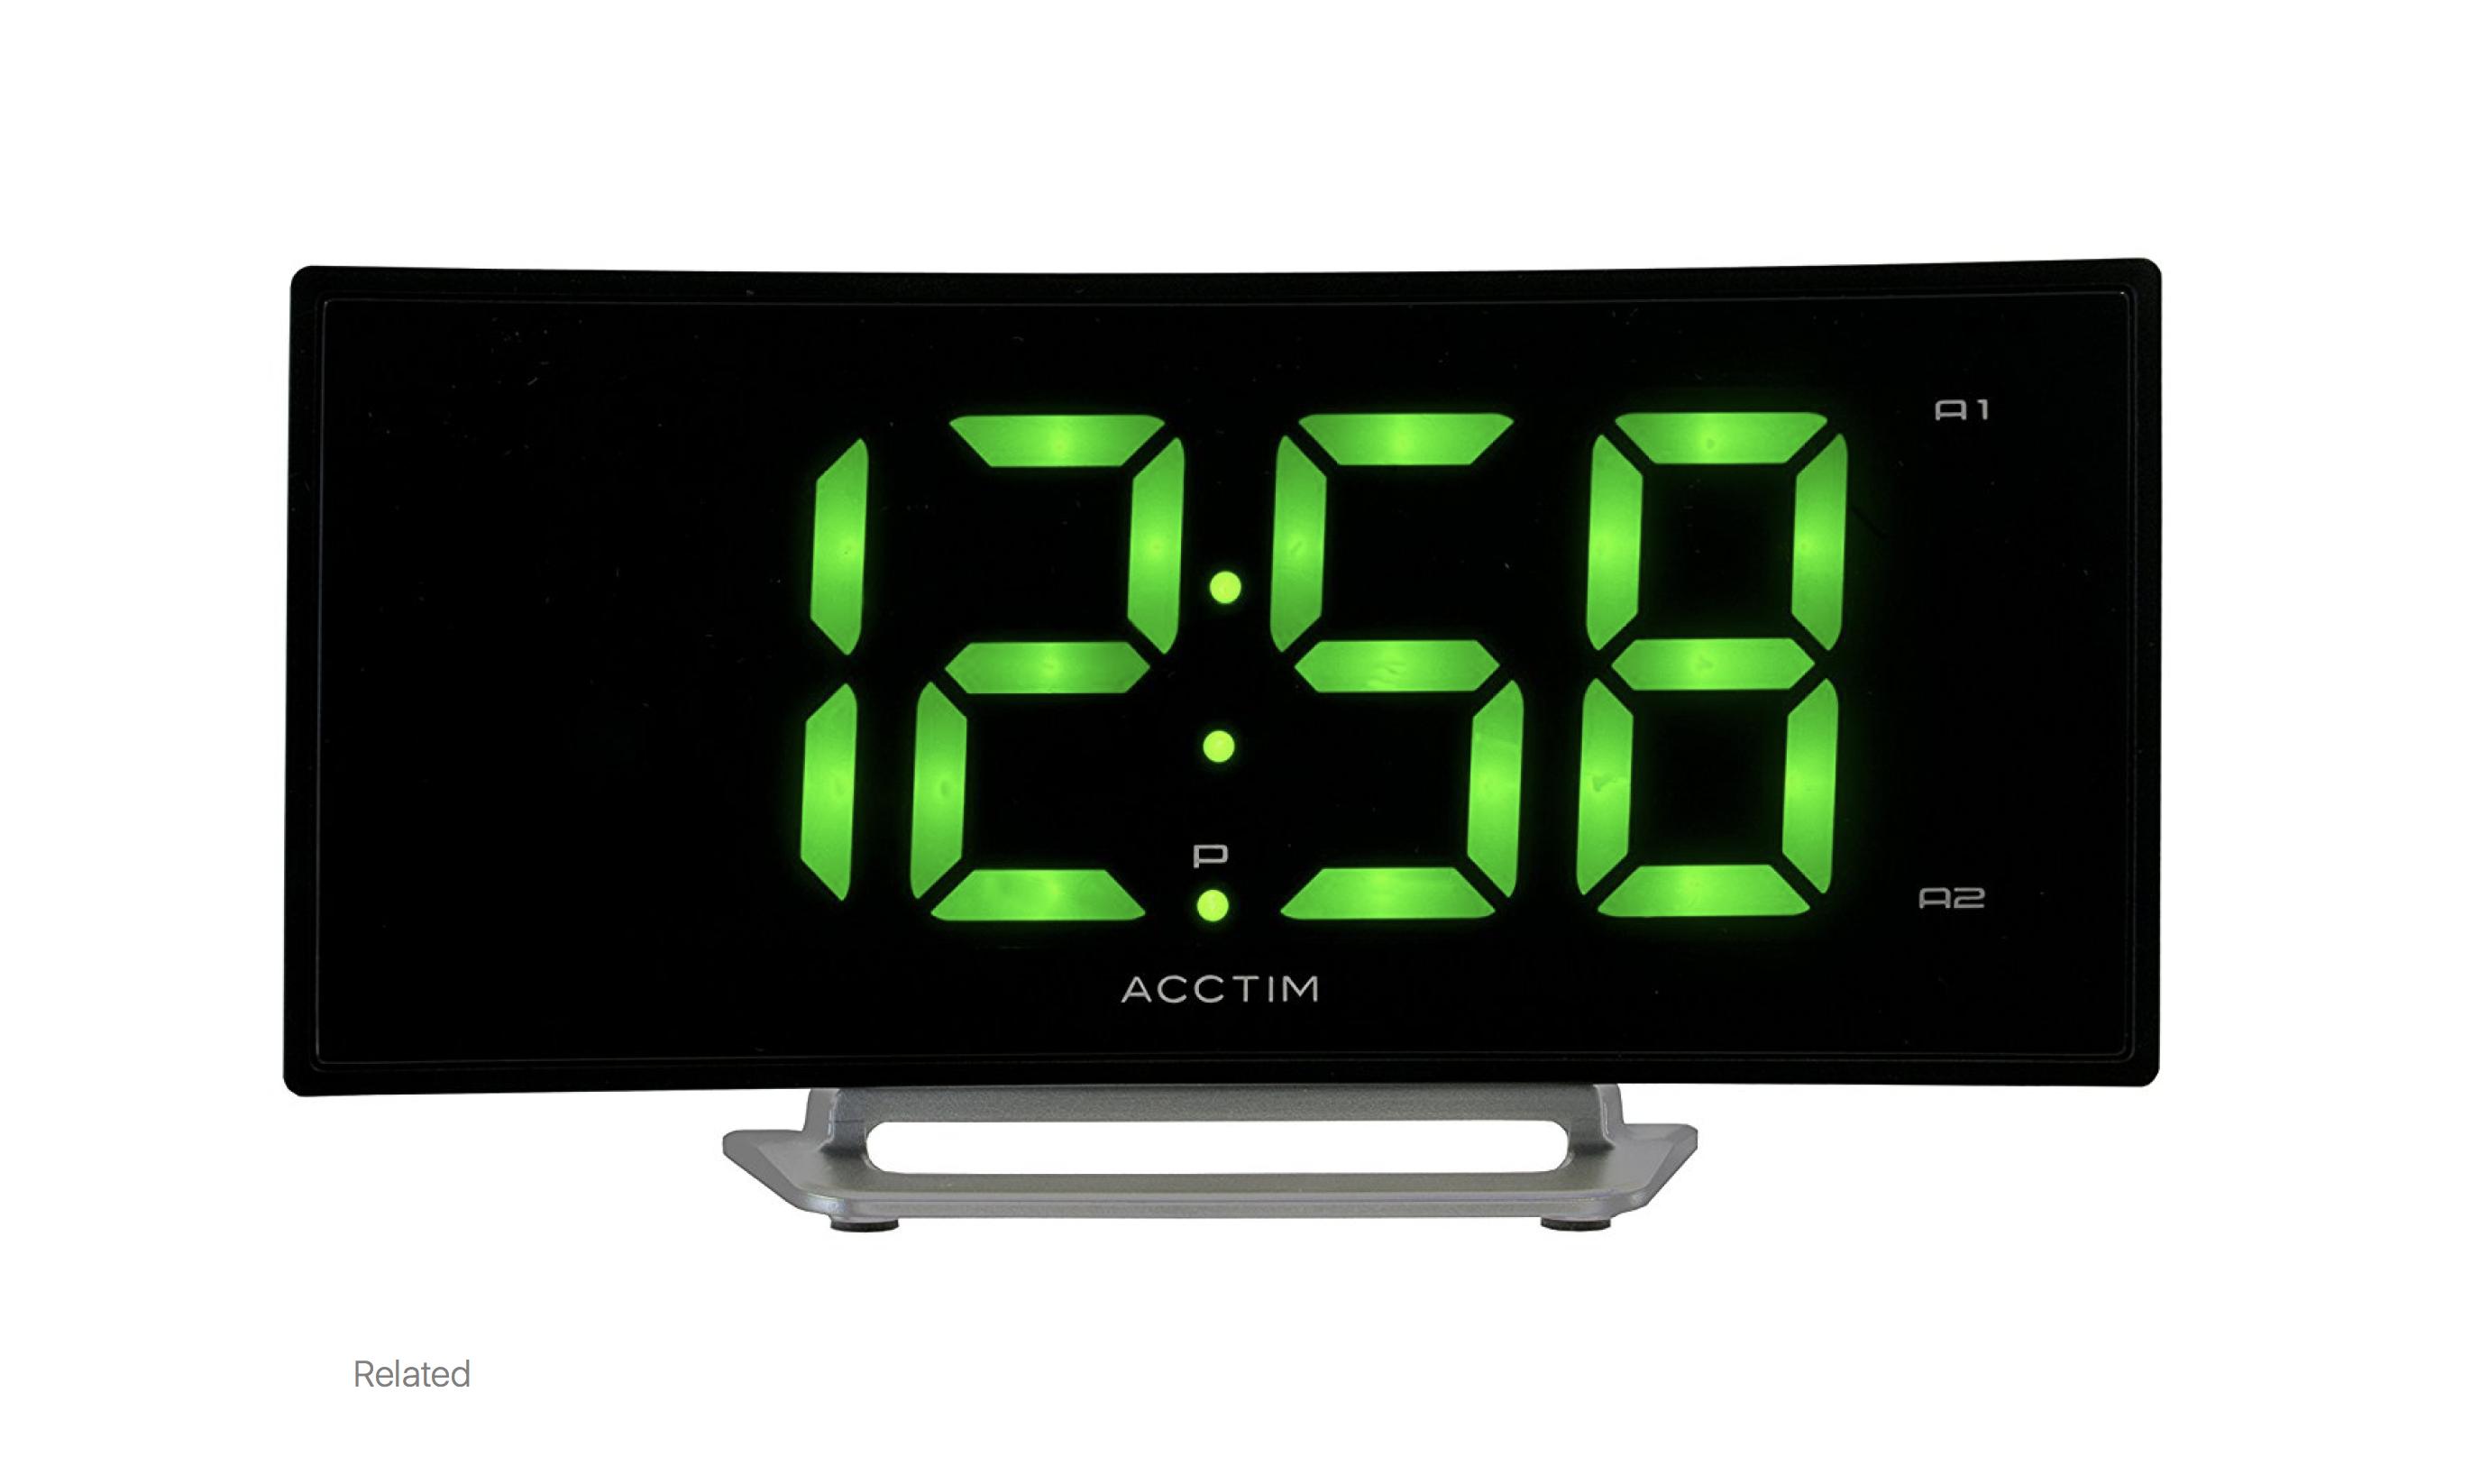 Acctim Sierra Alarm Clock 15003 37